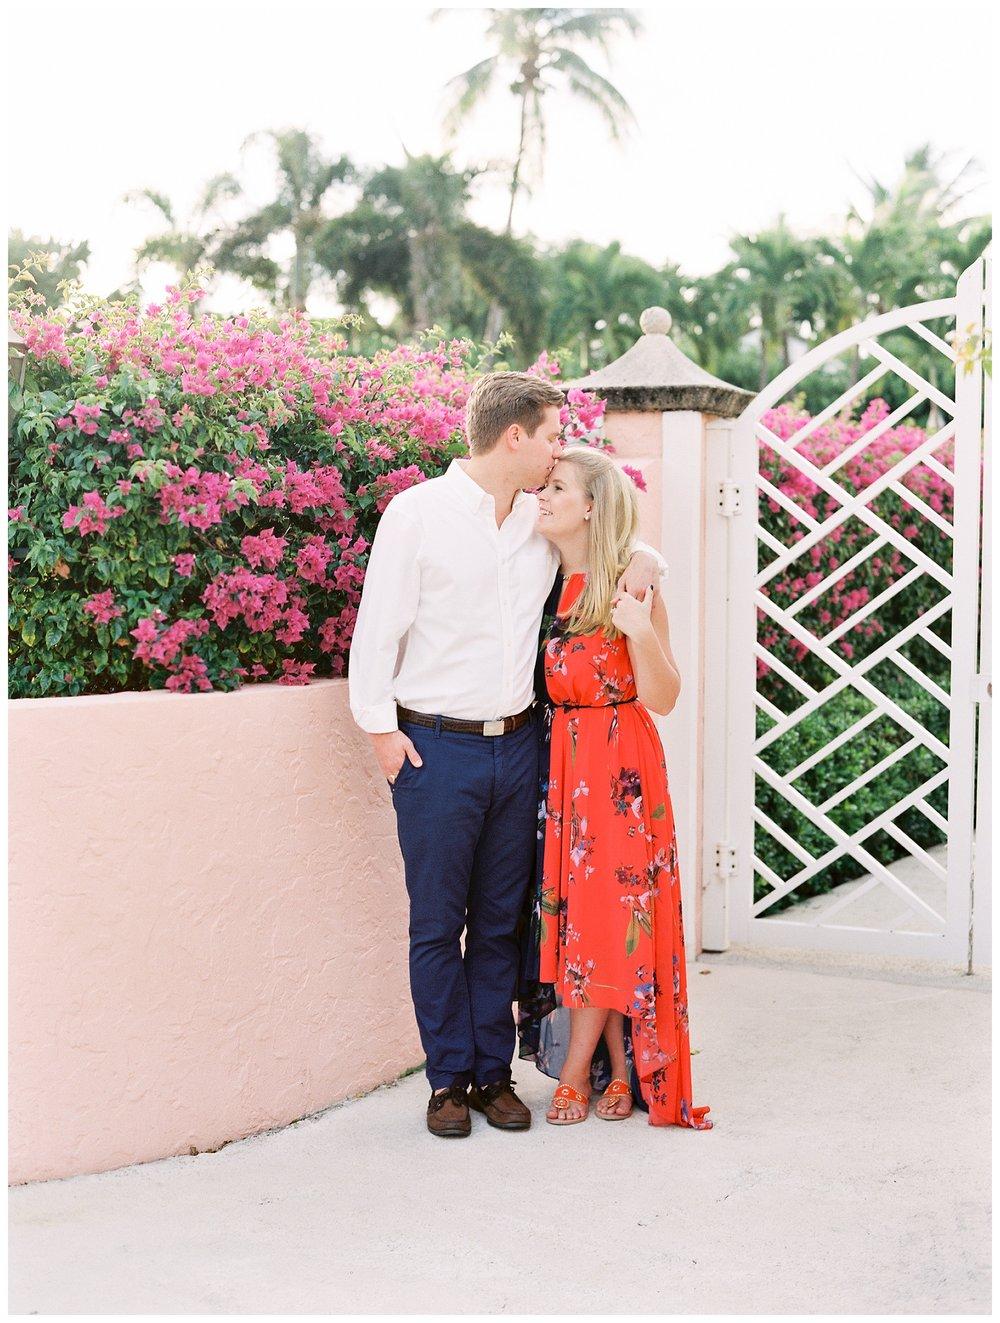 Cosmos Club Wedding | DC Wedding Photographer Kir Tuben_0125.jpg